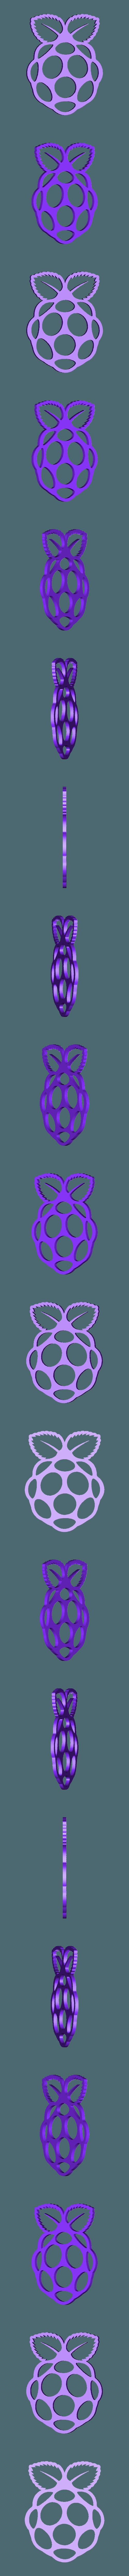 Raspberry-Pi-Logo.stl Download free STL file Raspberry Pi Logo • Model to 3D print, AwesomeA